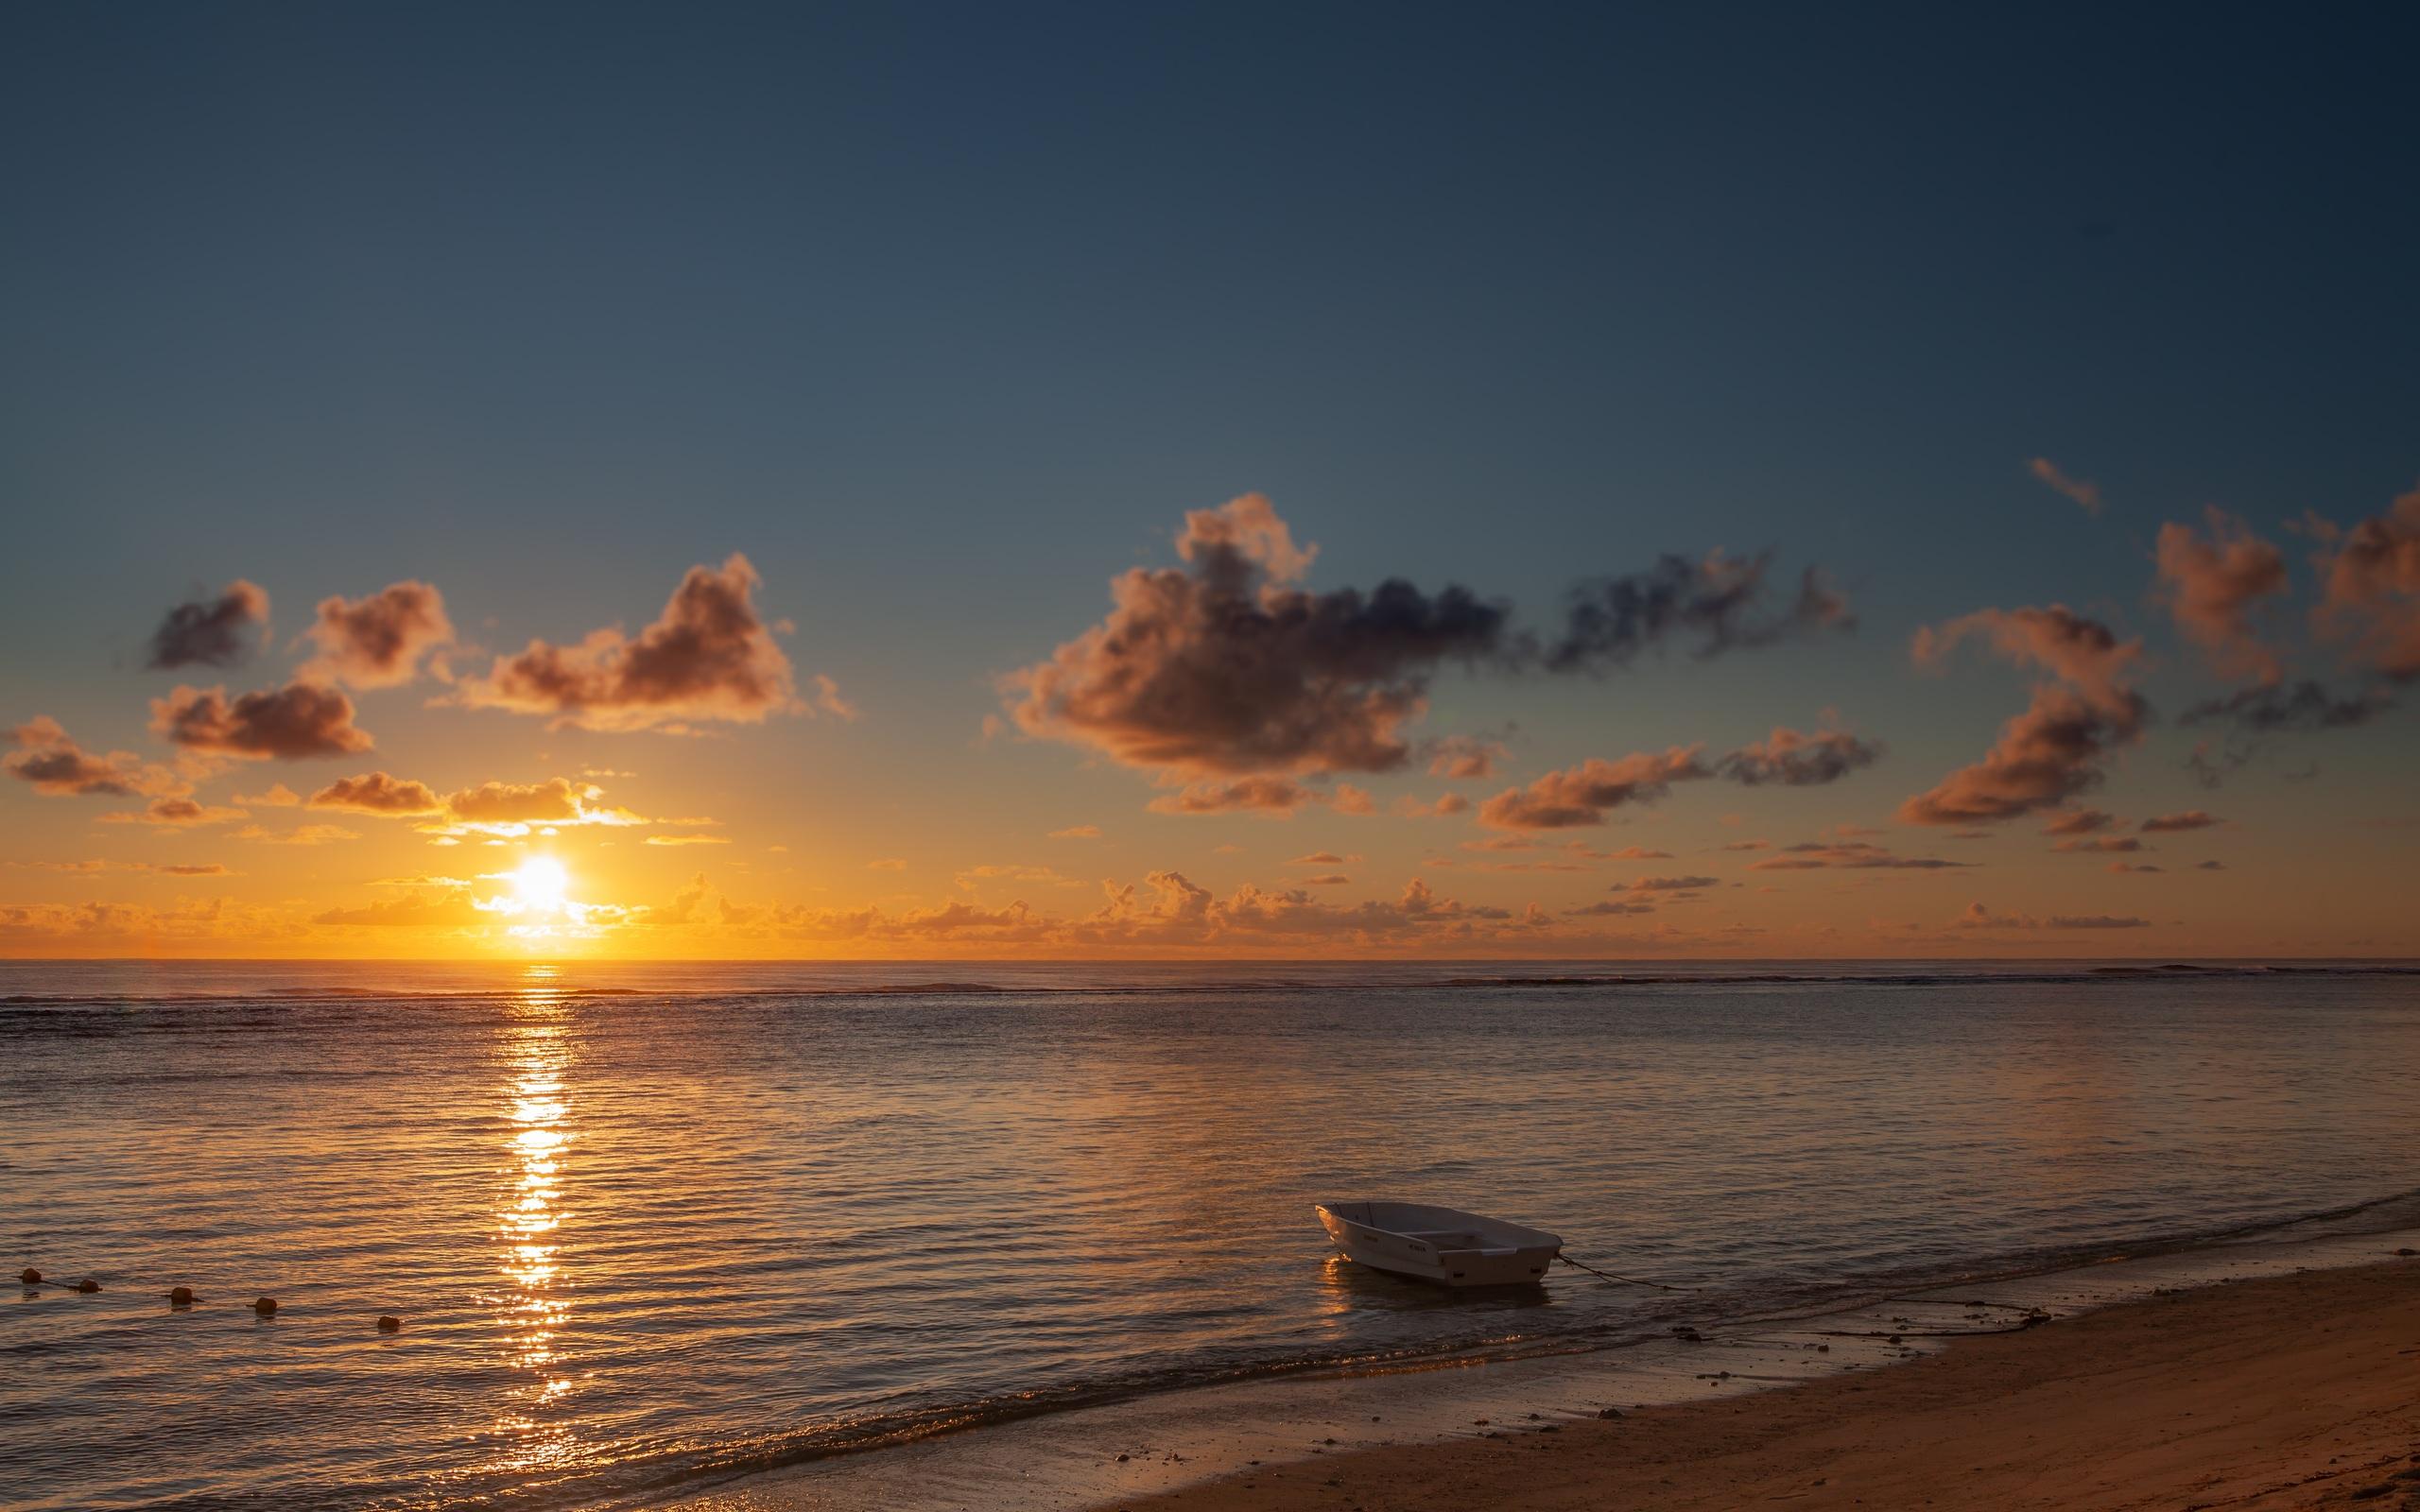 boat-sea-beach-sunset-5k-lk.jpg